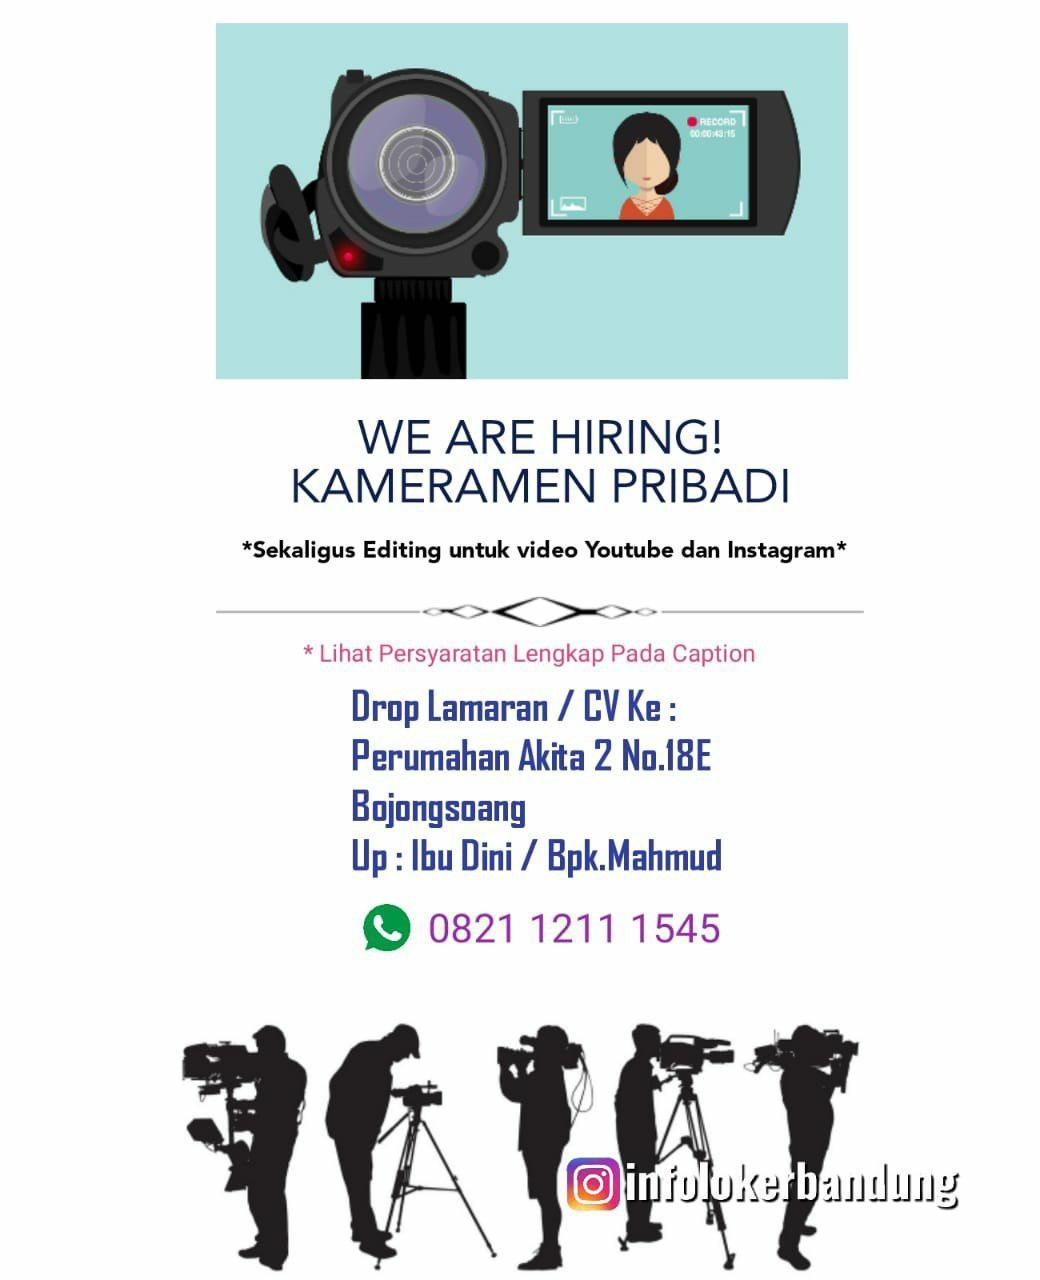 Lowongan Kerja Kameramen Pribadi Ammarrahmatullah Channel Bandung Maret 2019